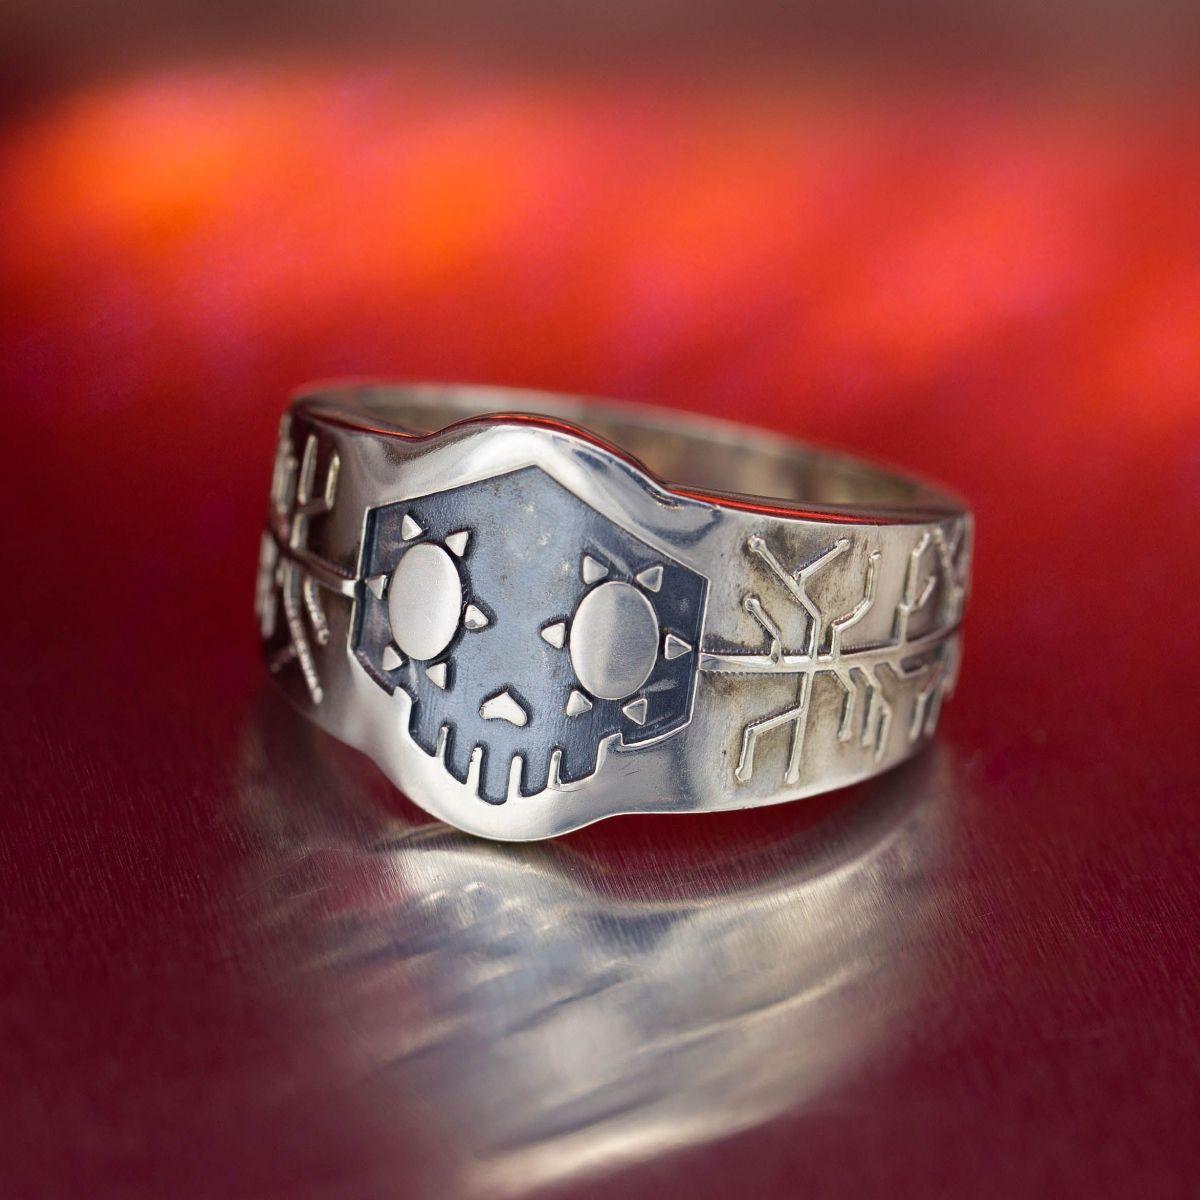 custom biker rings design your own motorcycle club ring. Black Bedroom Furniture Sets. Home Design Ideas